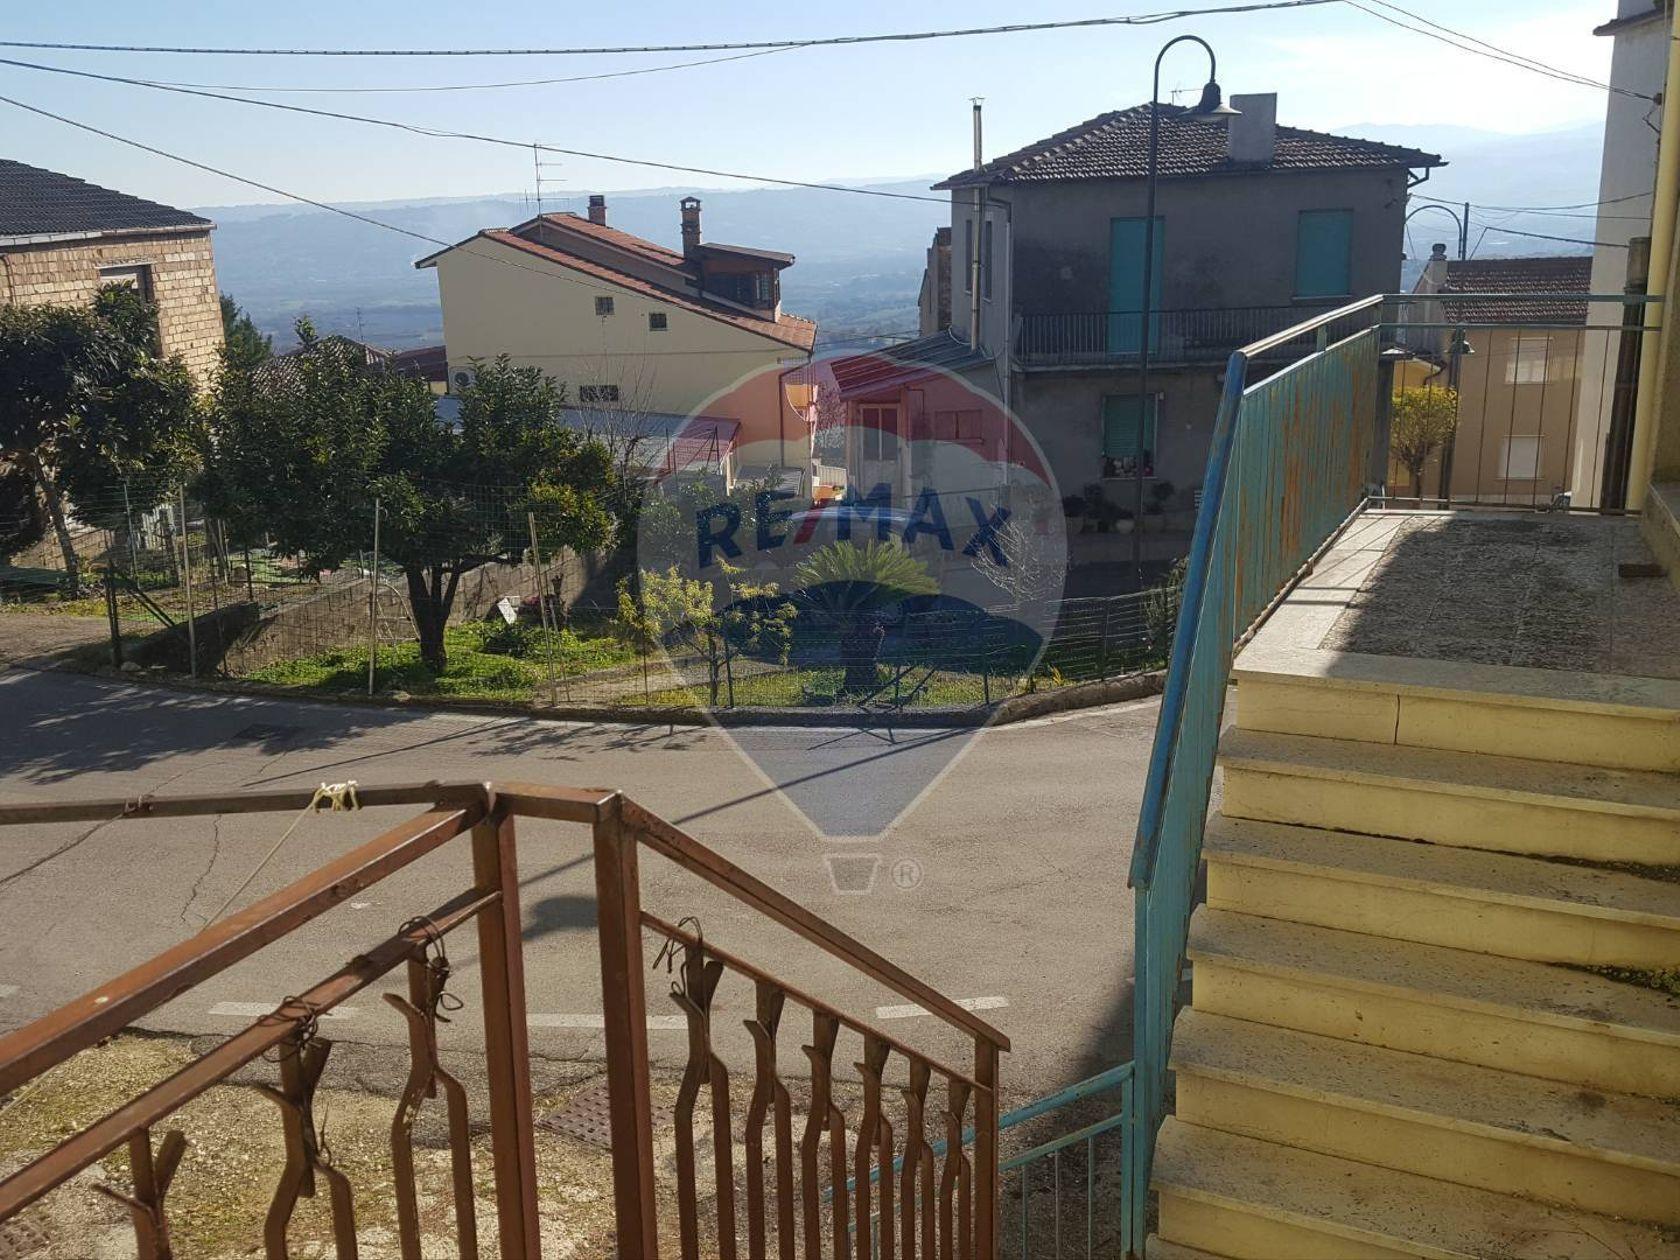 Casa Semindipendente Mozzagrogna, Mozzagrogna, CH Vendita - Foto 2